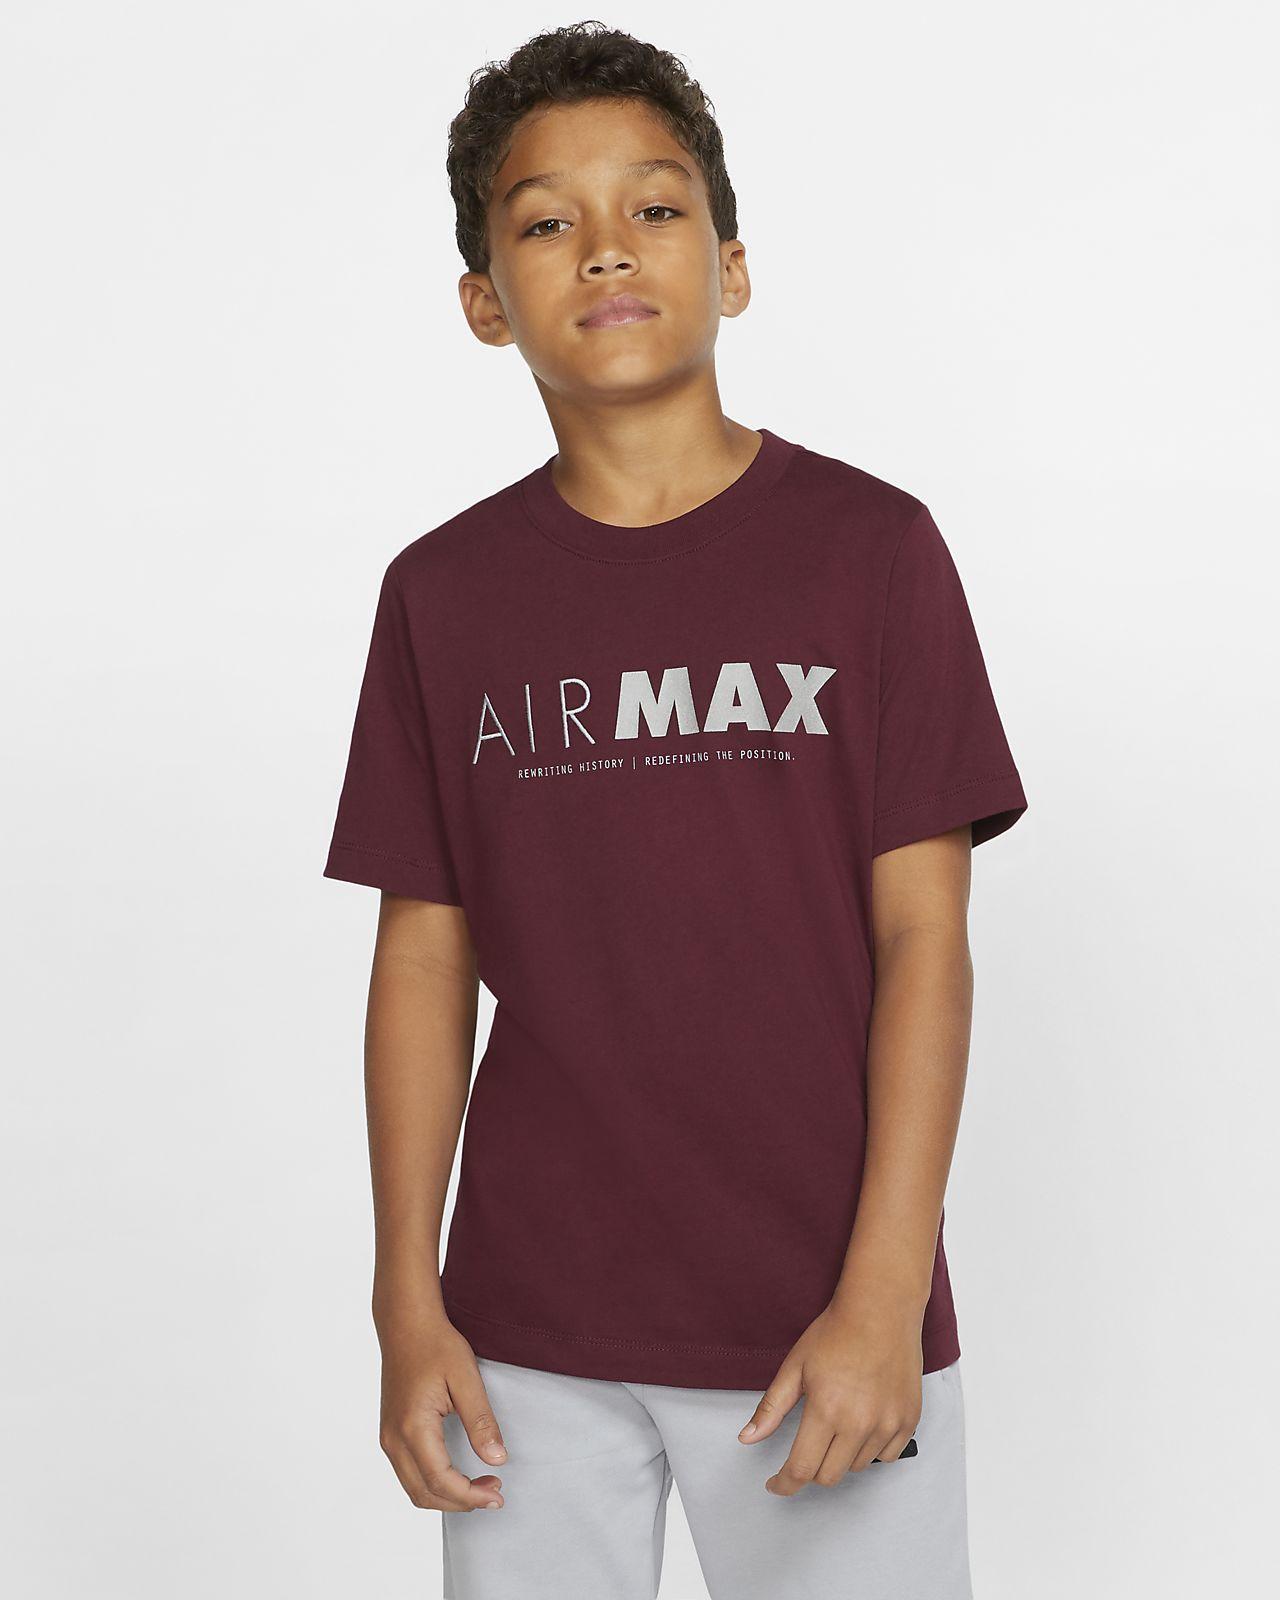 Nike Sportswear Air Max Older Kids' Short-Sleeve T-Shirt